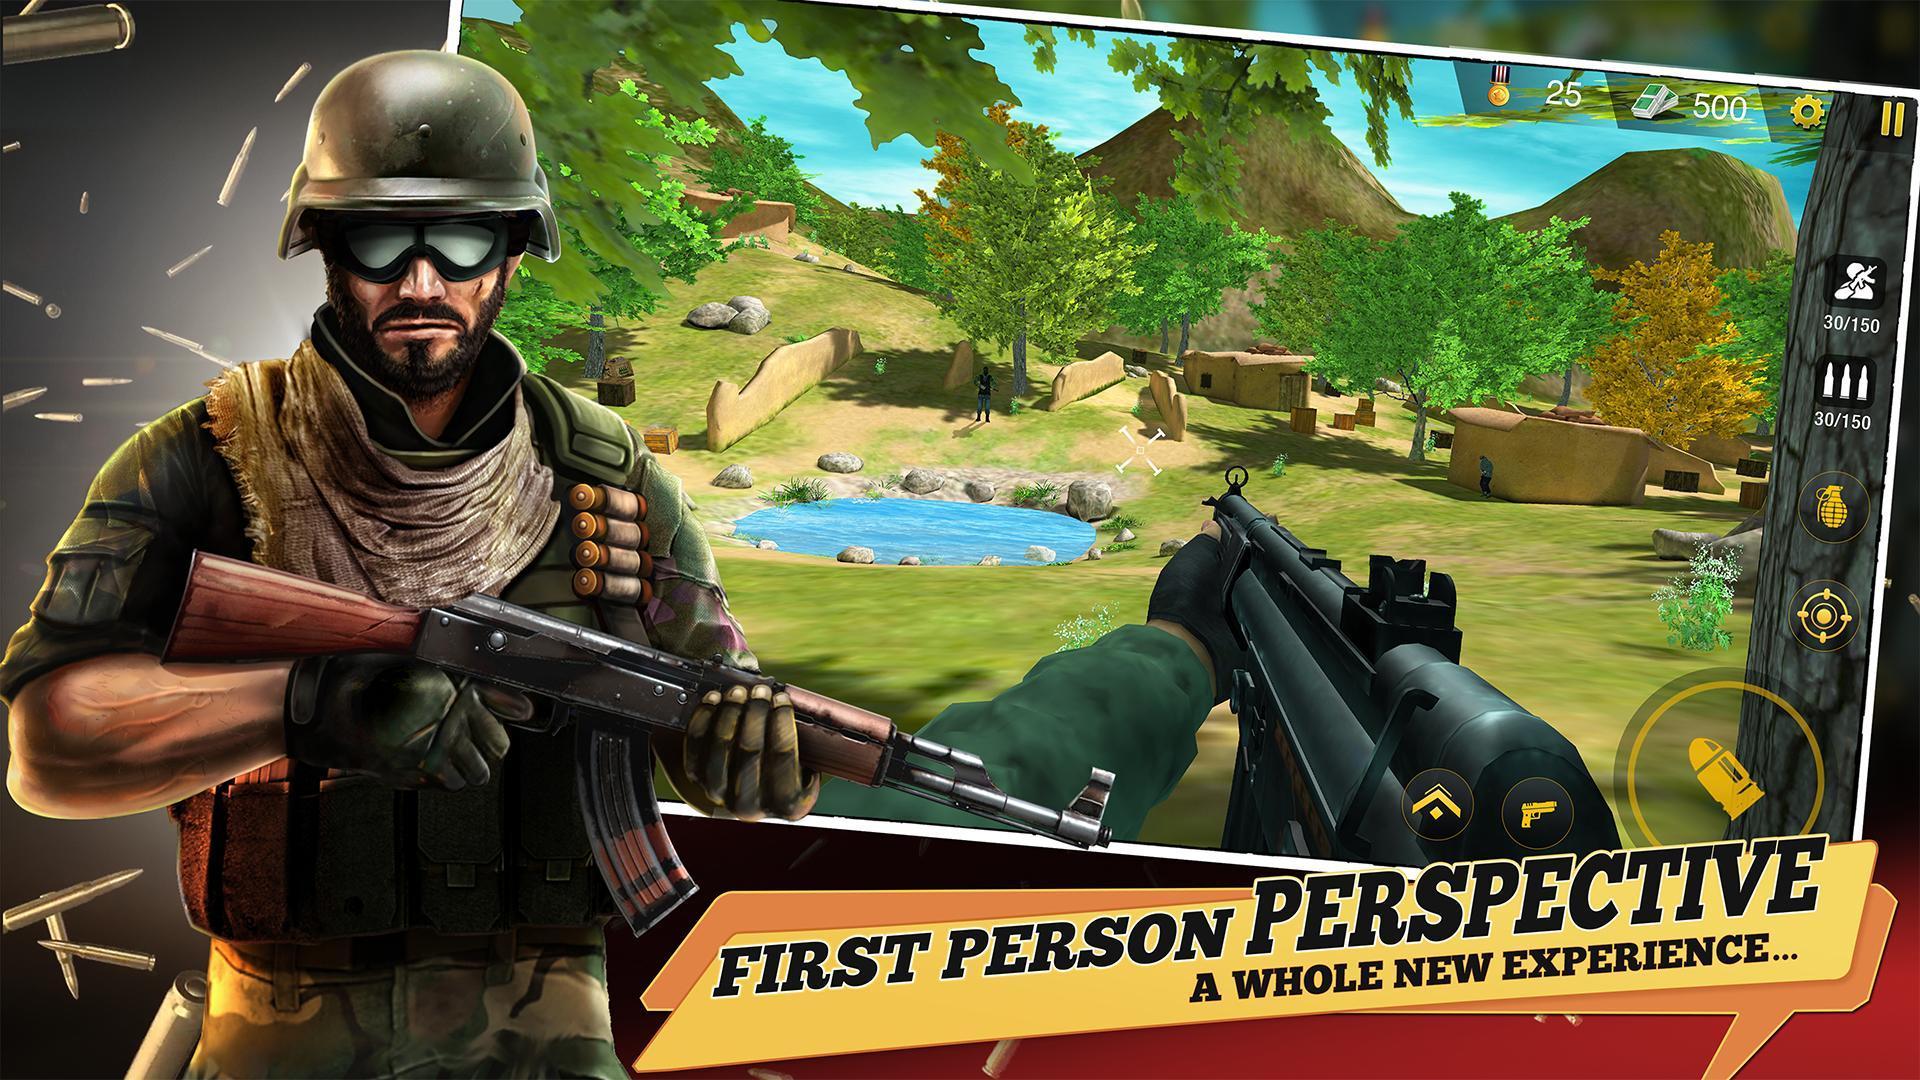 Yalghaar Delta IGI Commando Adventure Mobile Game 3.4 Screenshot 1